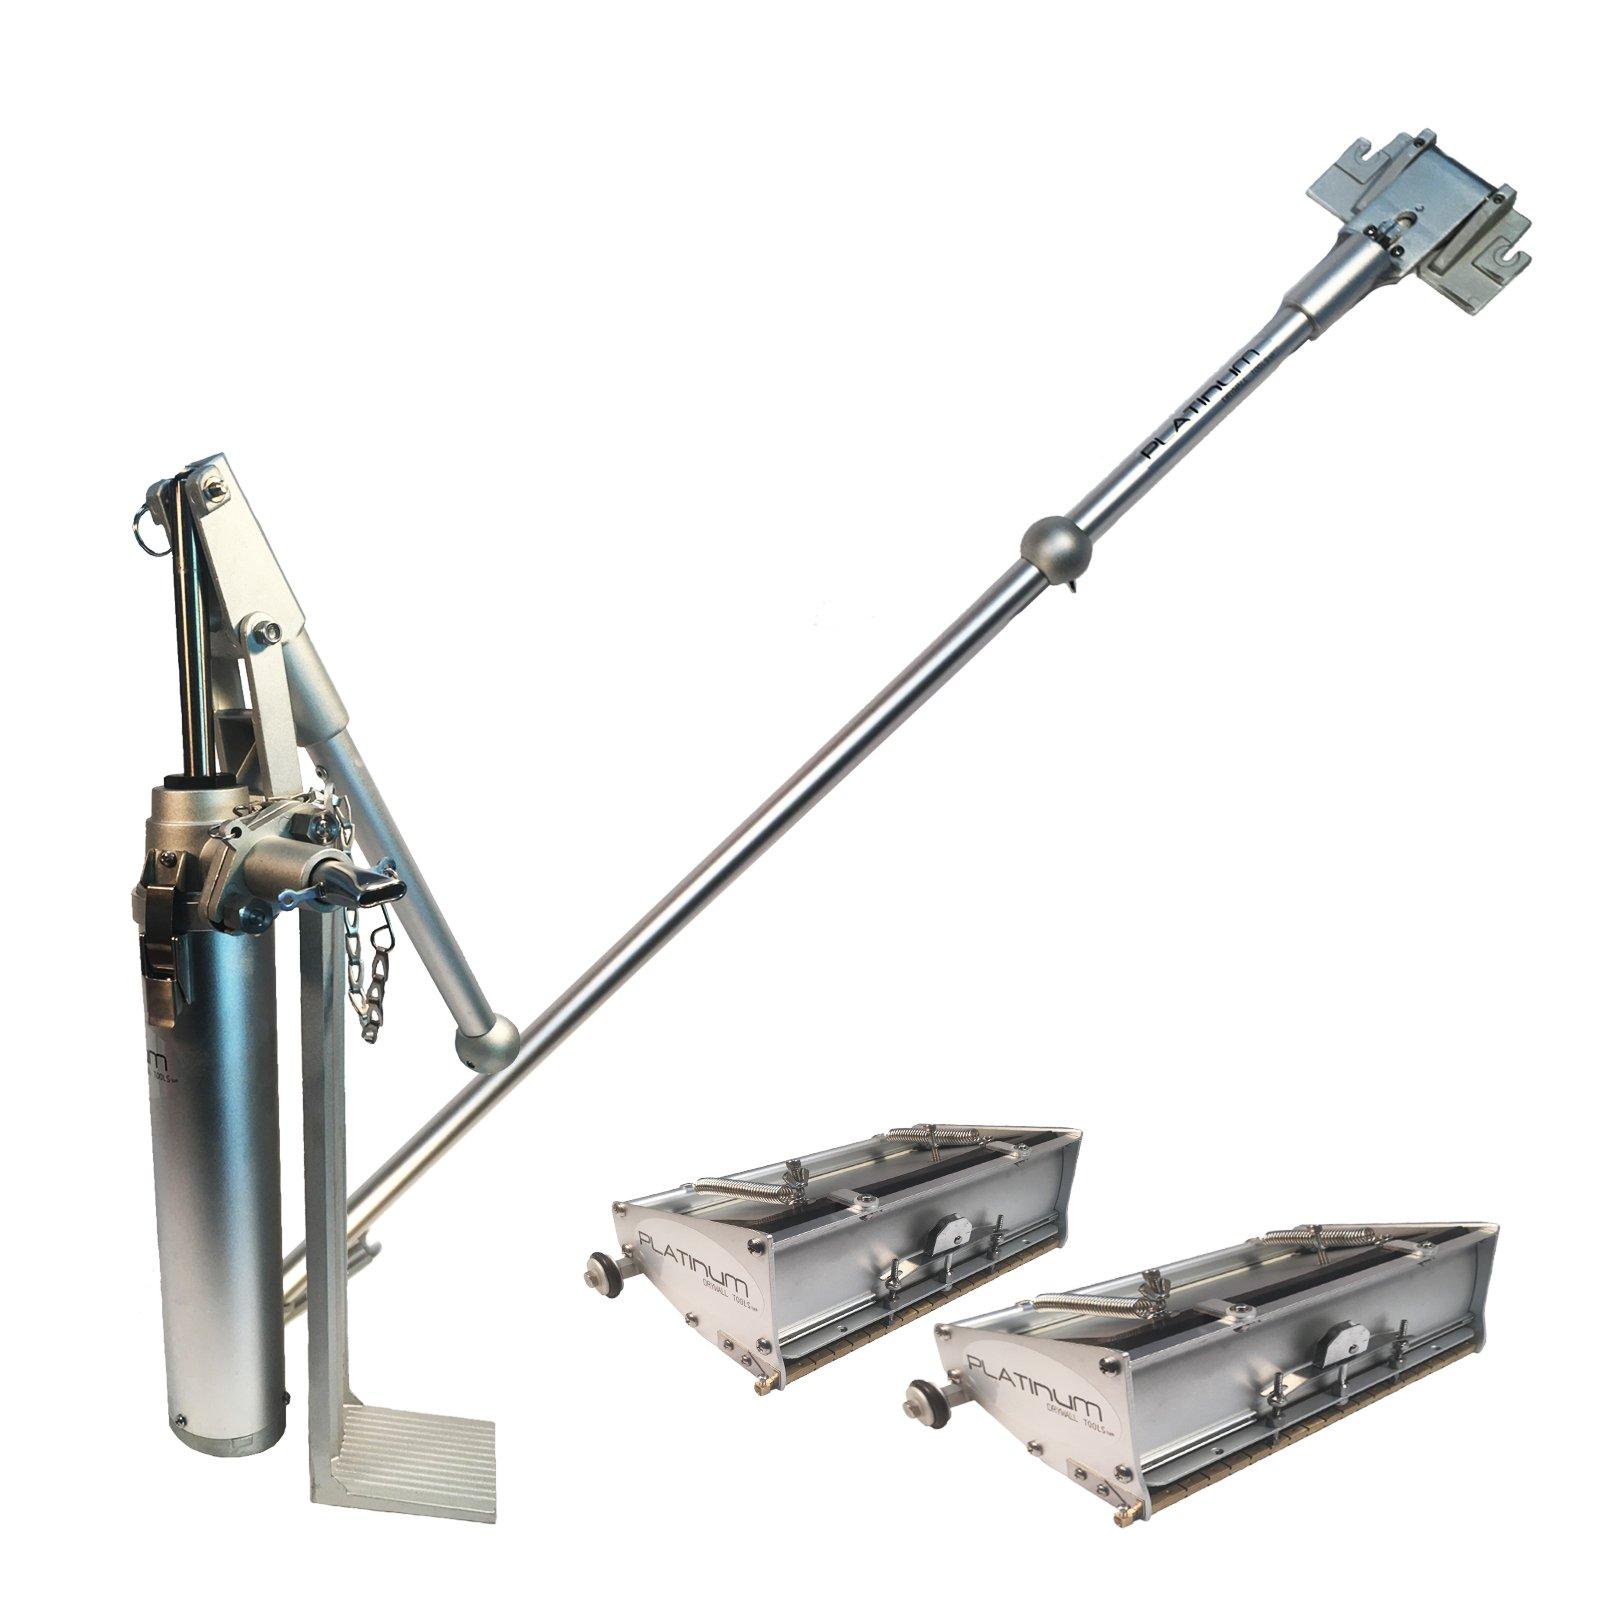 Platinum Drywall Tools Flat Box Set with 10 & 12 inch Boxes by Platinum Drywall Tools